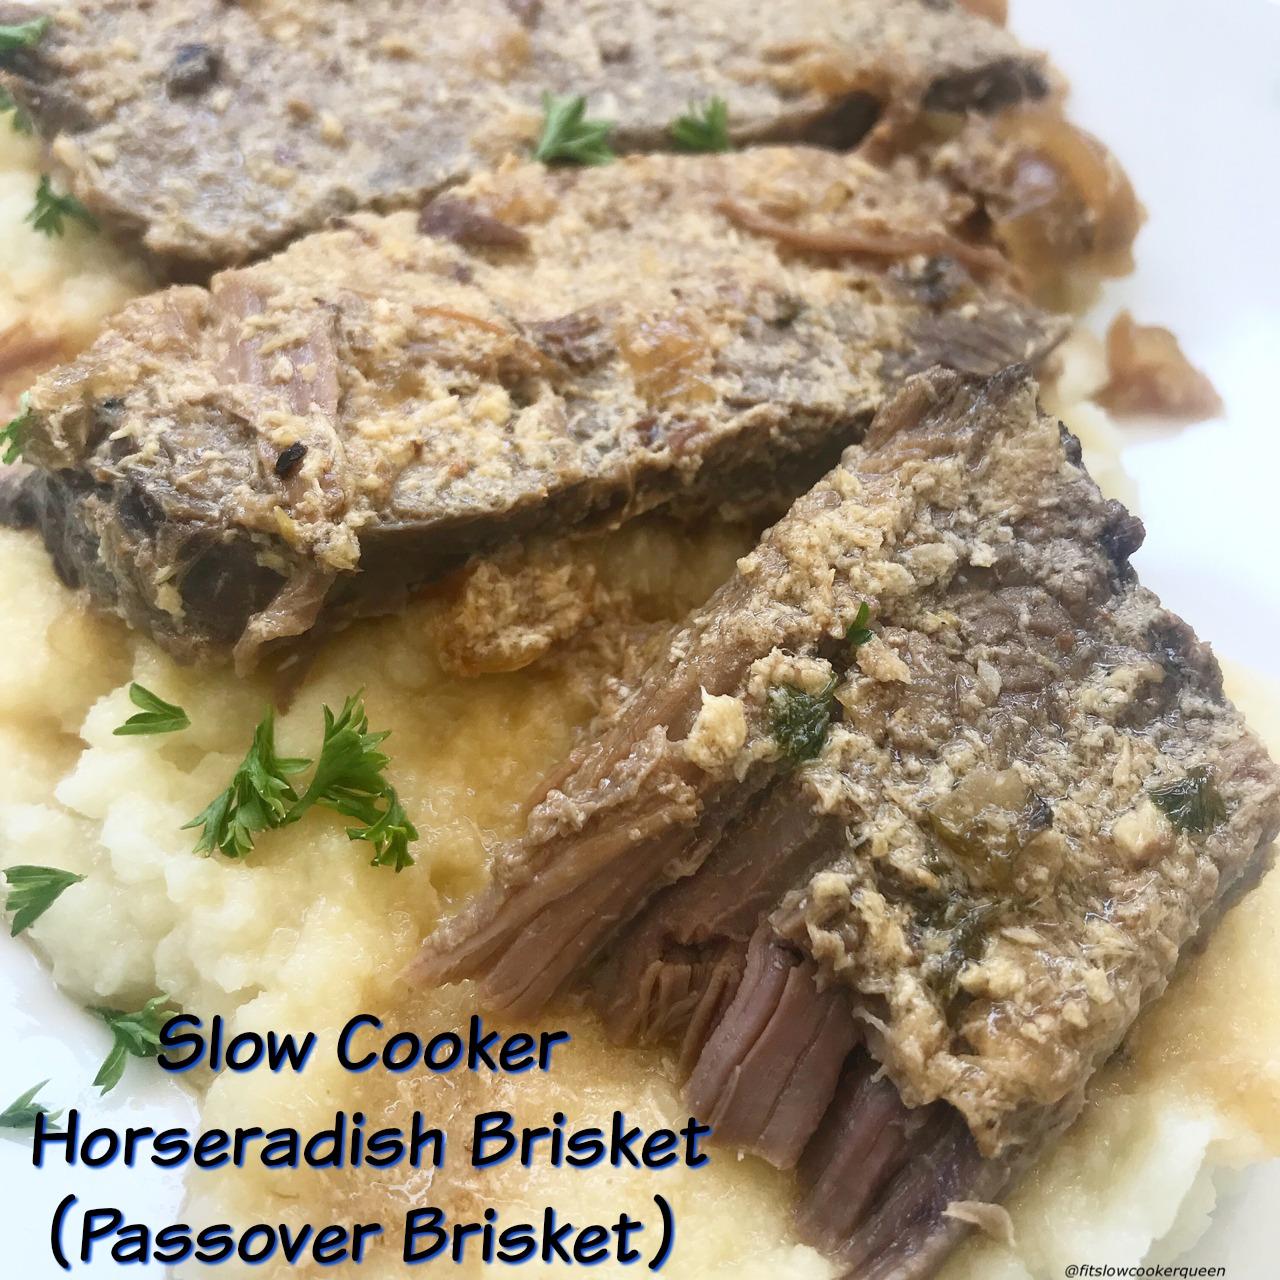 slow cooker horseradish brisket passover brisket fit slow cooker